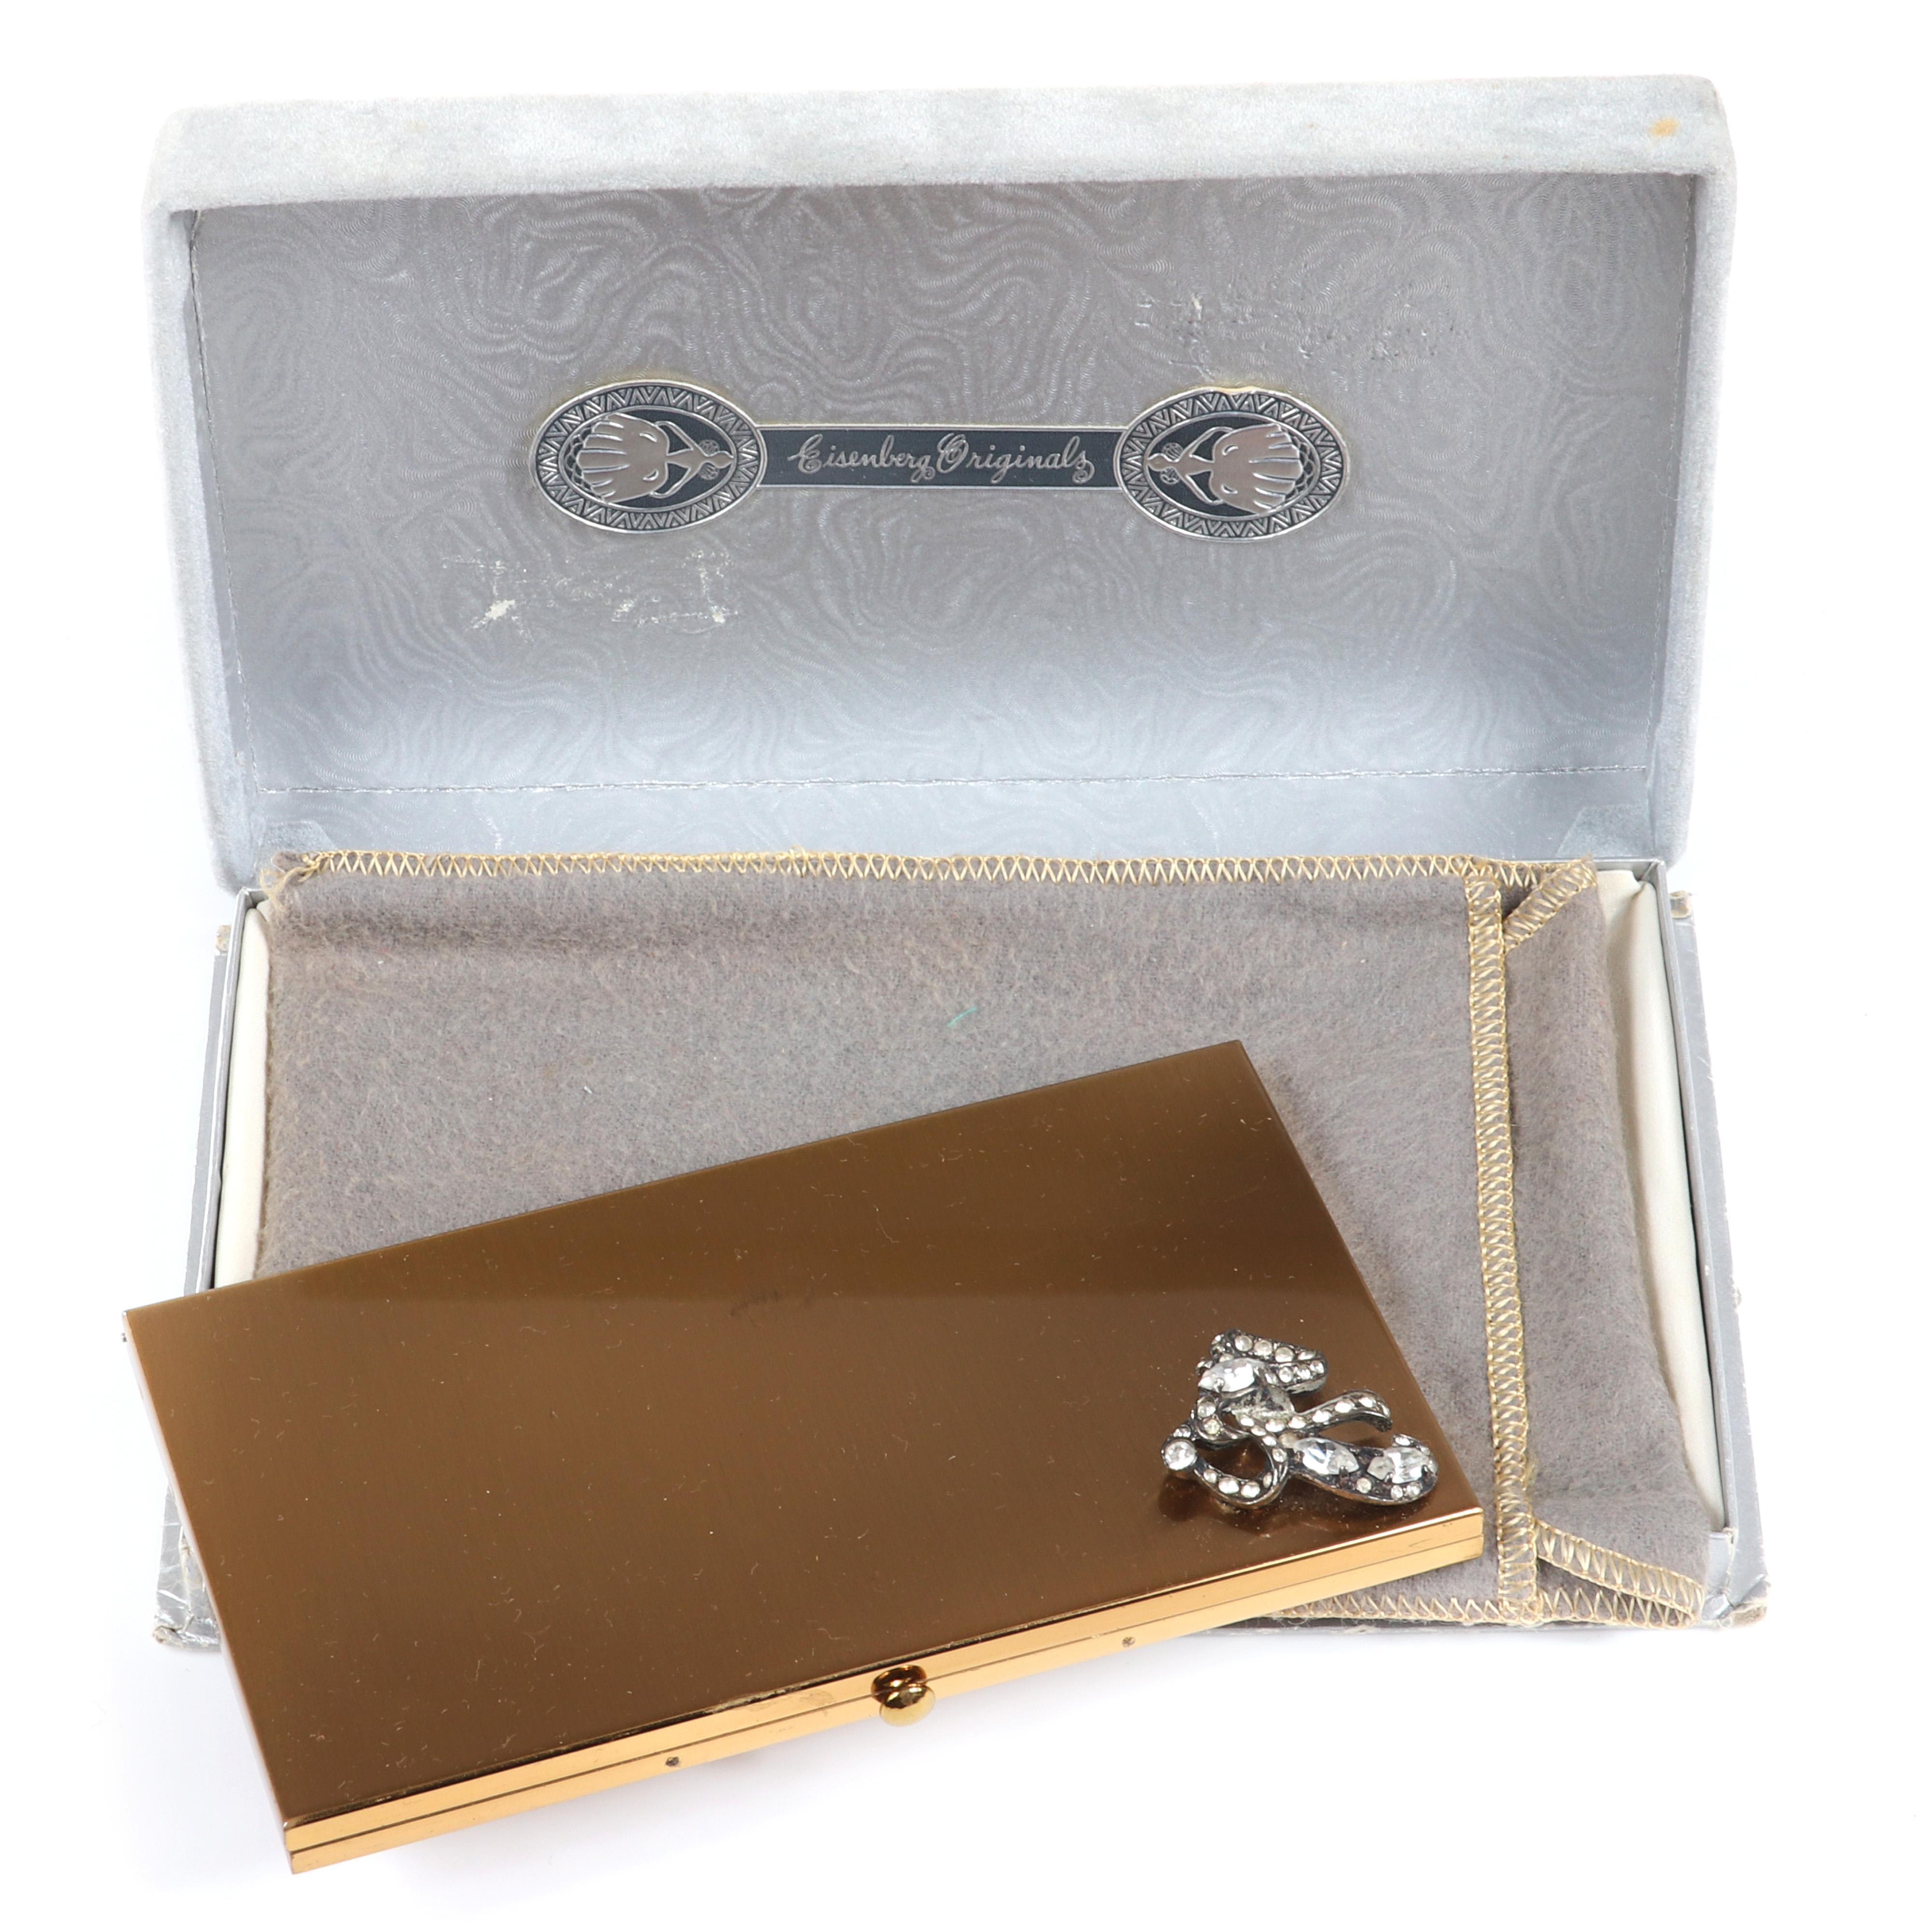 "Eisenberg Original gold tone cigarette case with silver pot metal and pave dimensional ribbon bow original box, felt liner and interior cigarette tray, c. 1940s. 3"" x 5 1/2"""